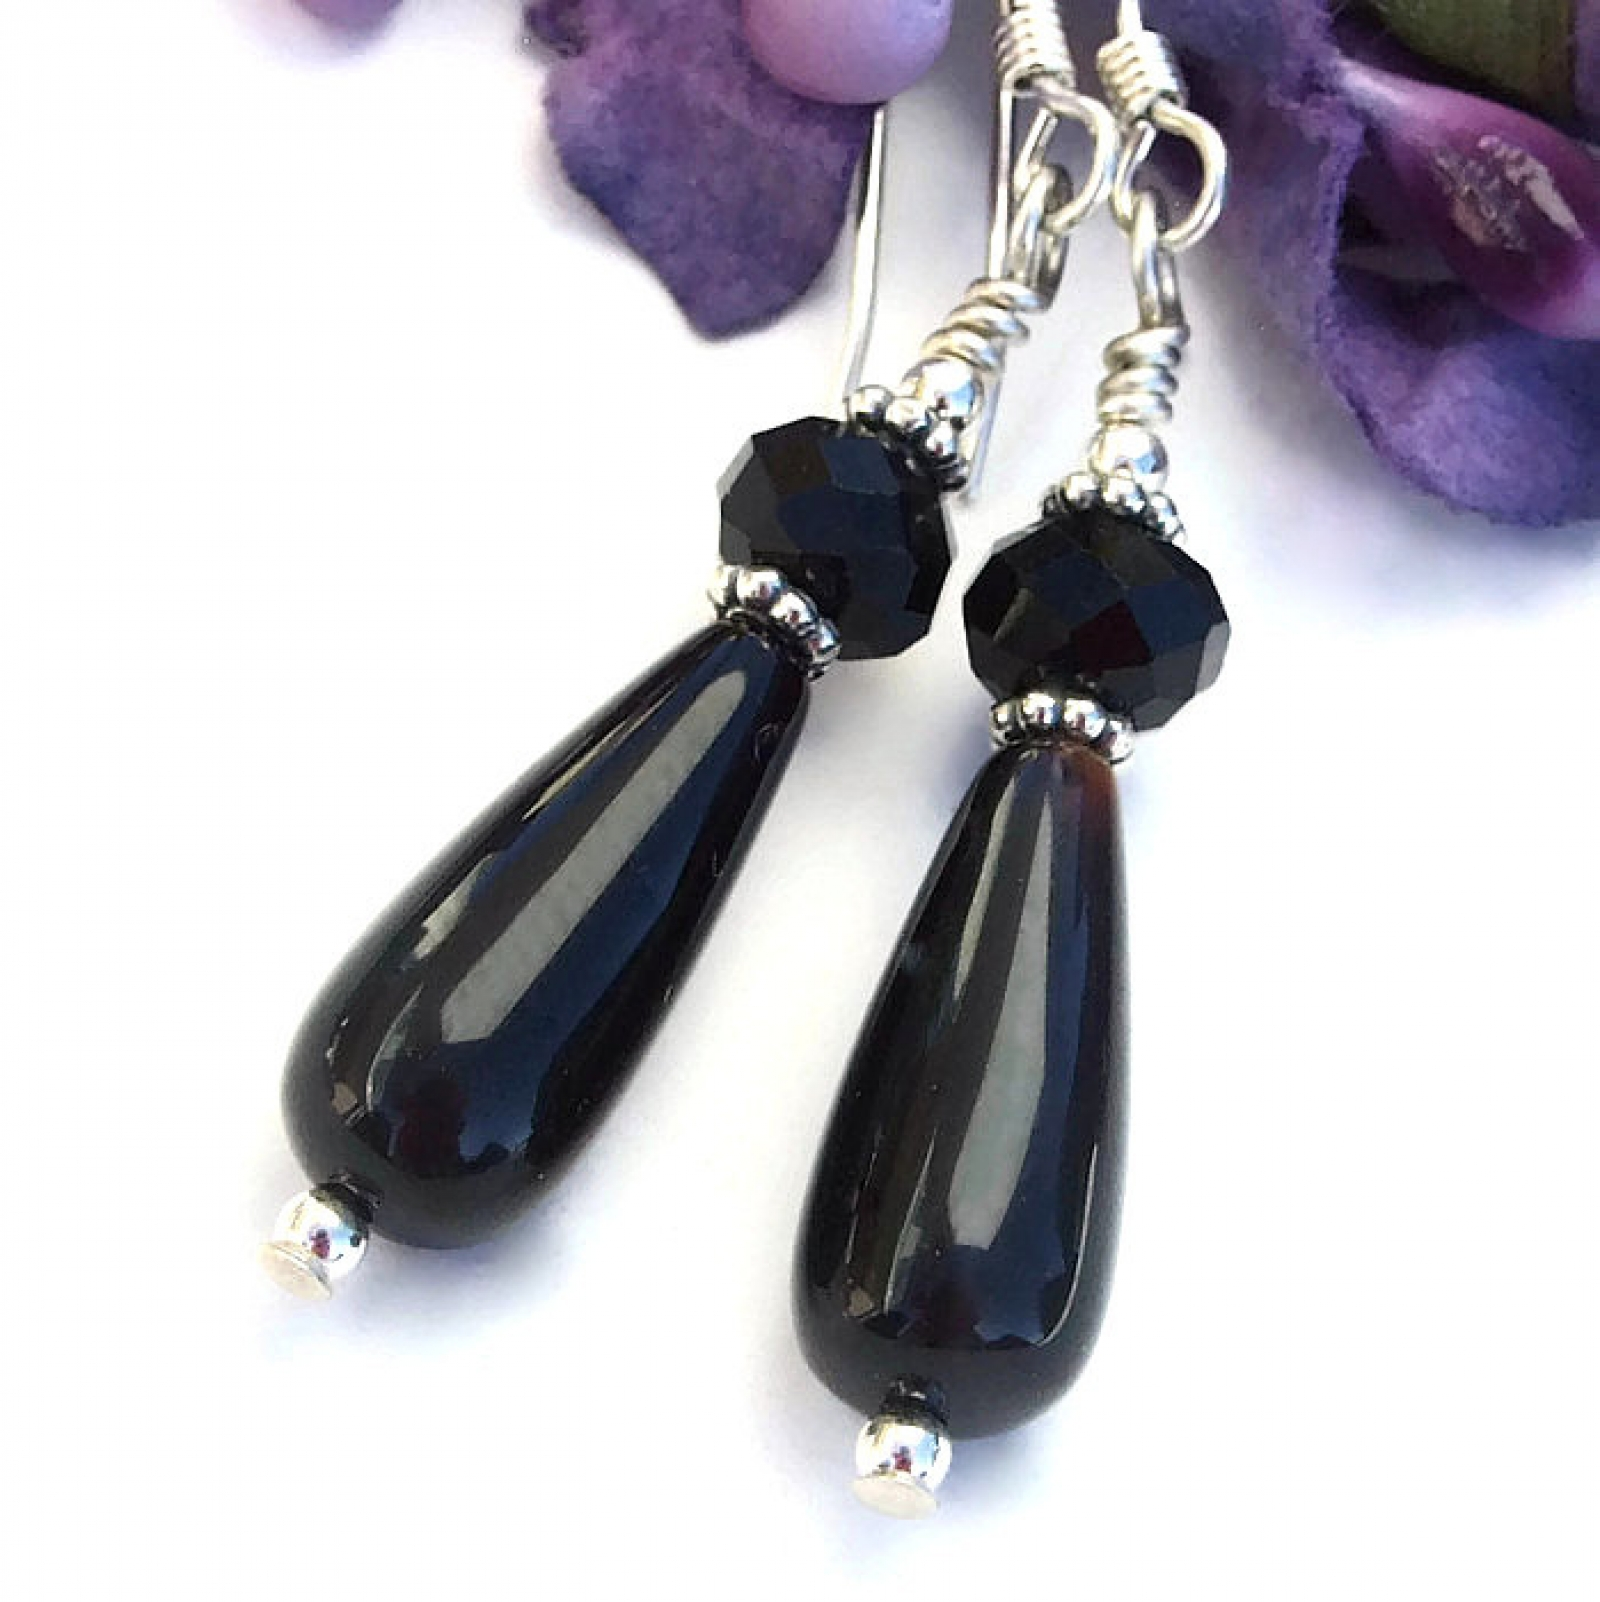 26e5b0b5b Black onyx and sterling jewelry, gift idea for her. Teardrop earrings.